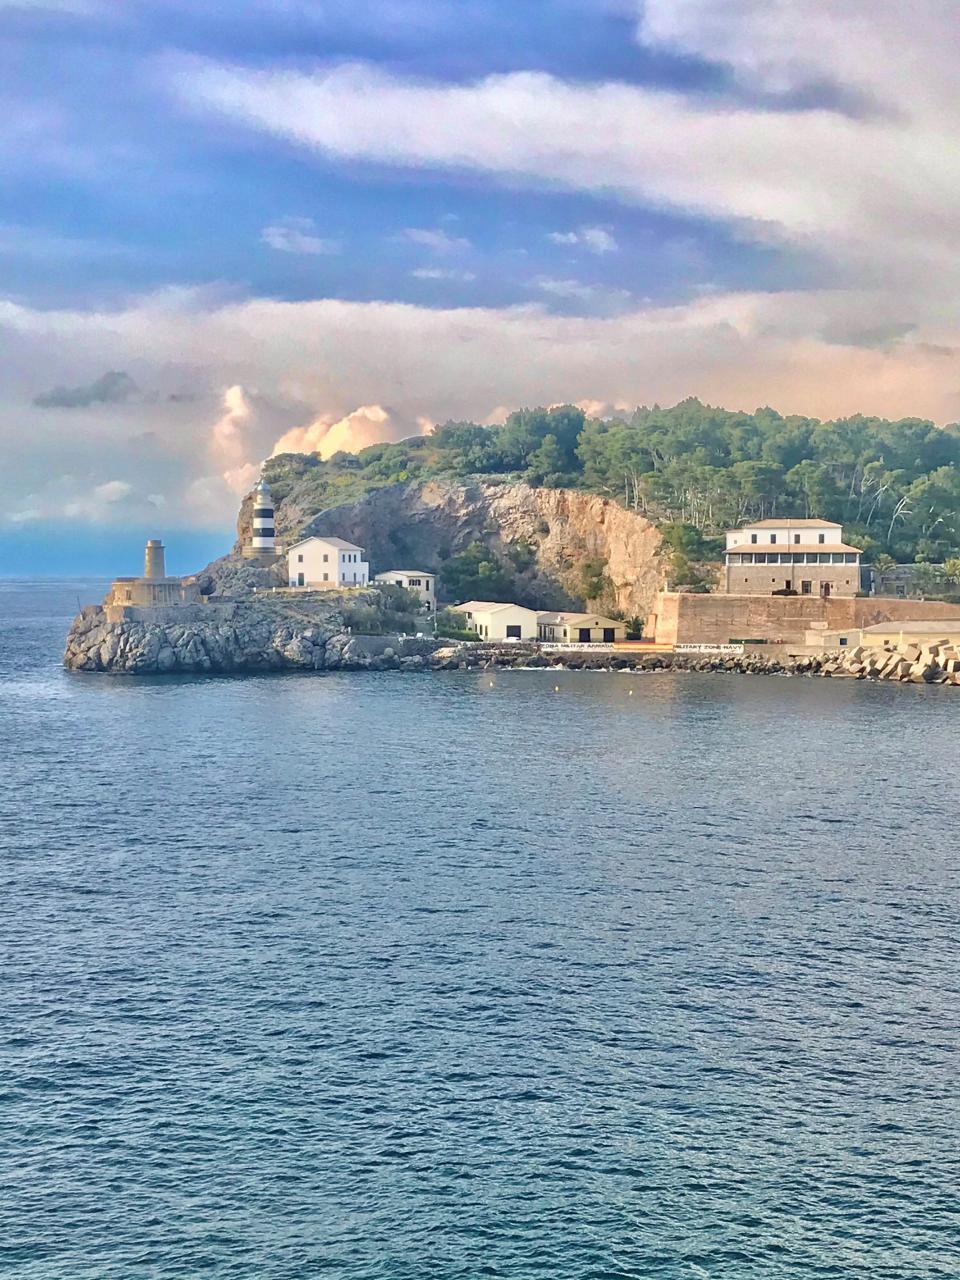 The old Sa Muleta lighthouse